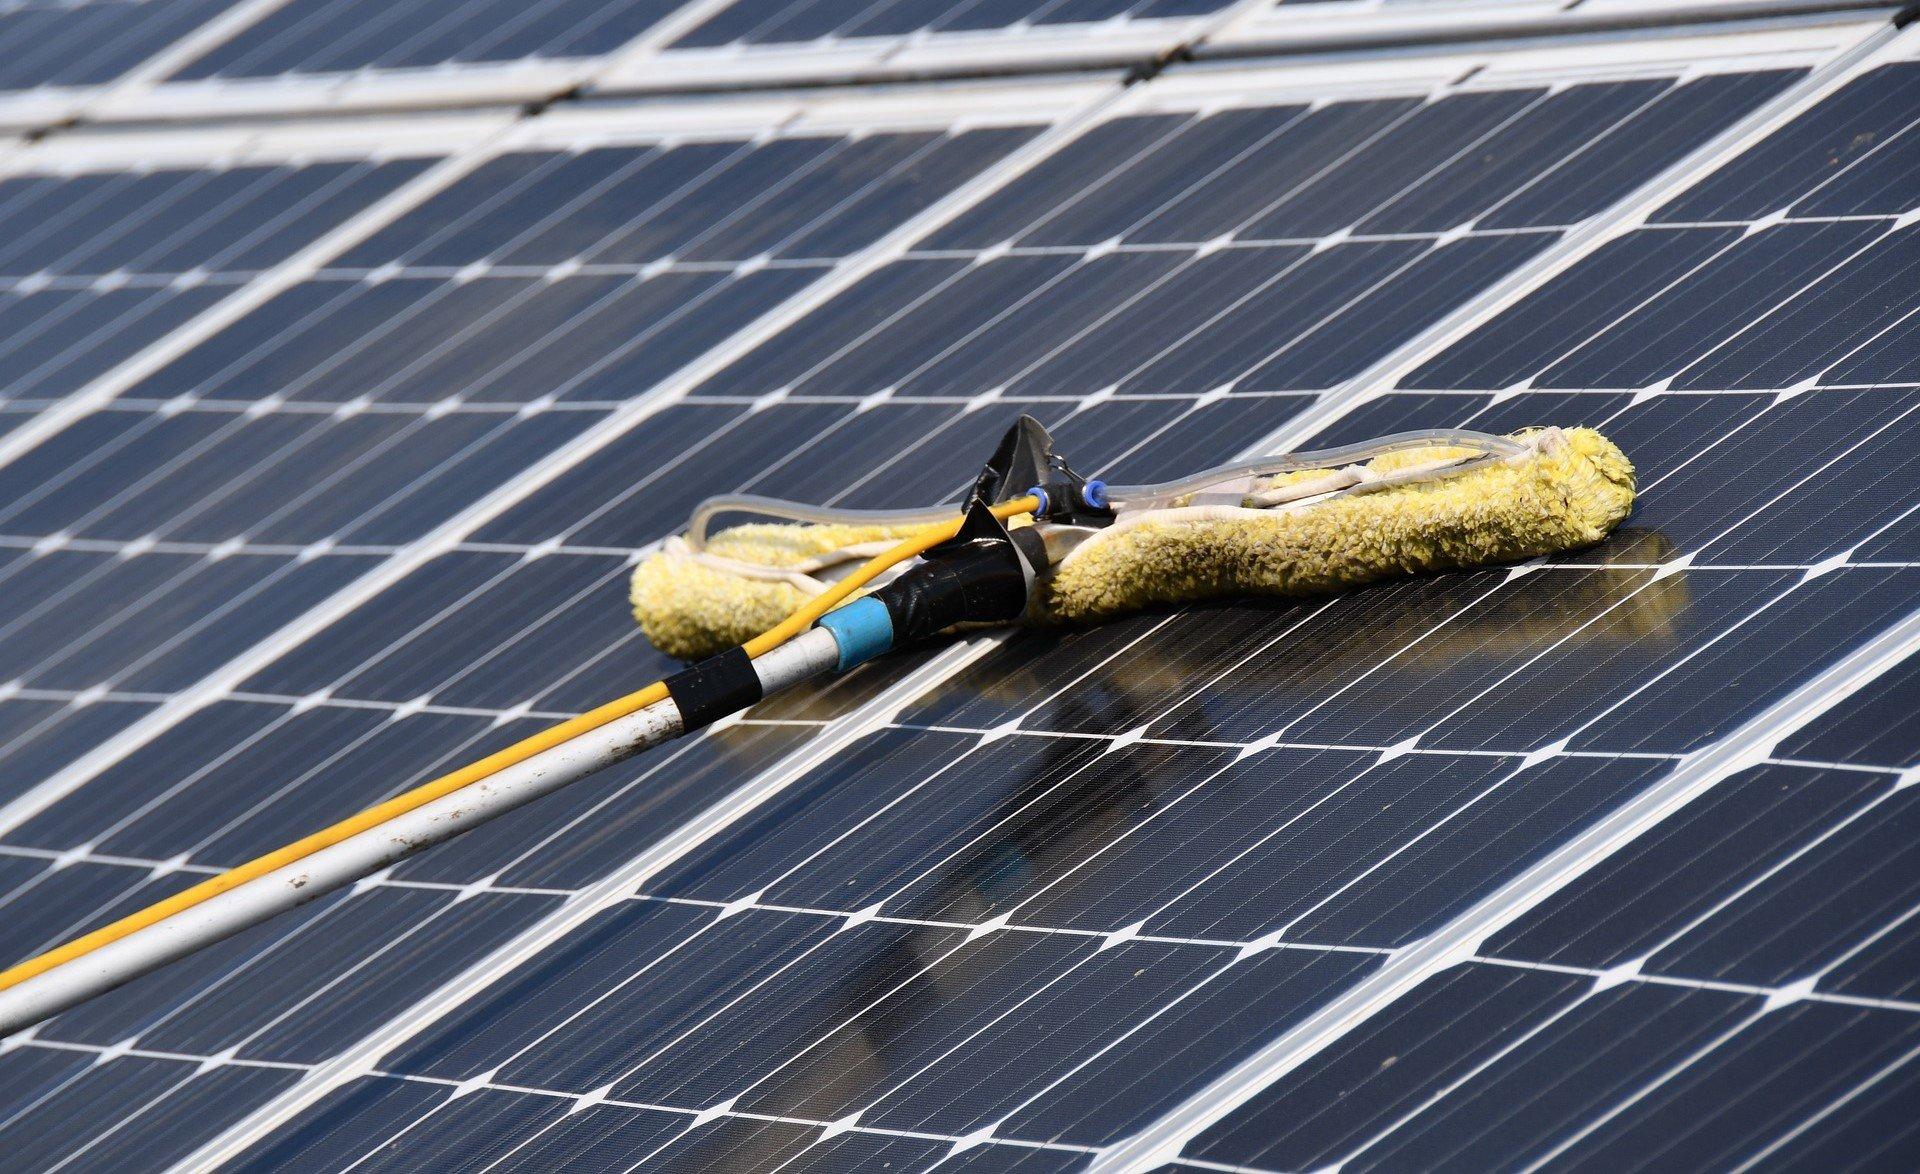 solar panel maintenance checklist